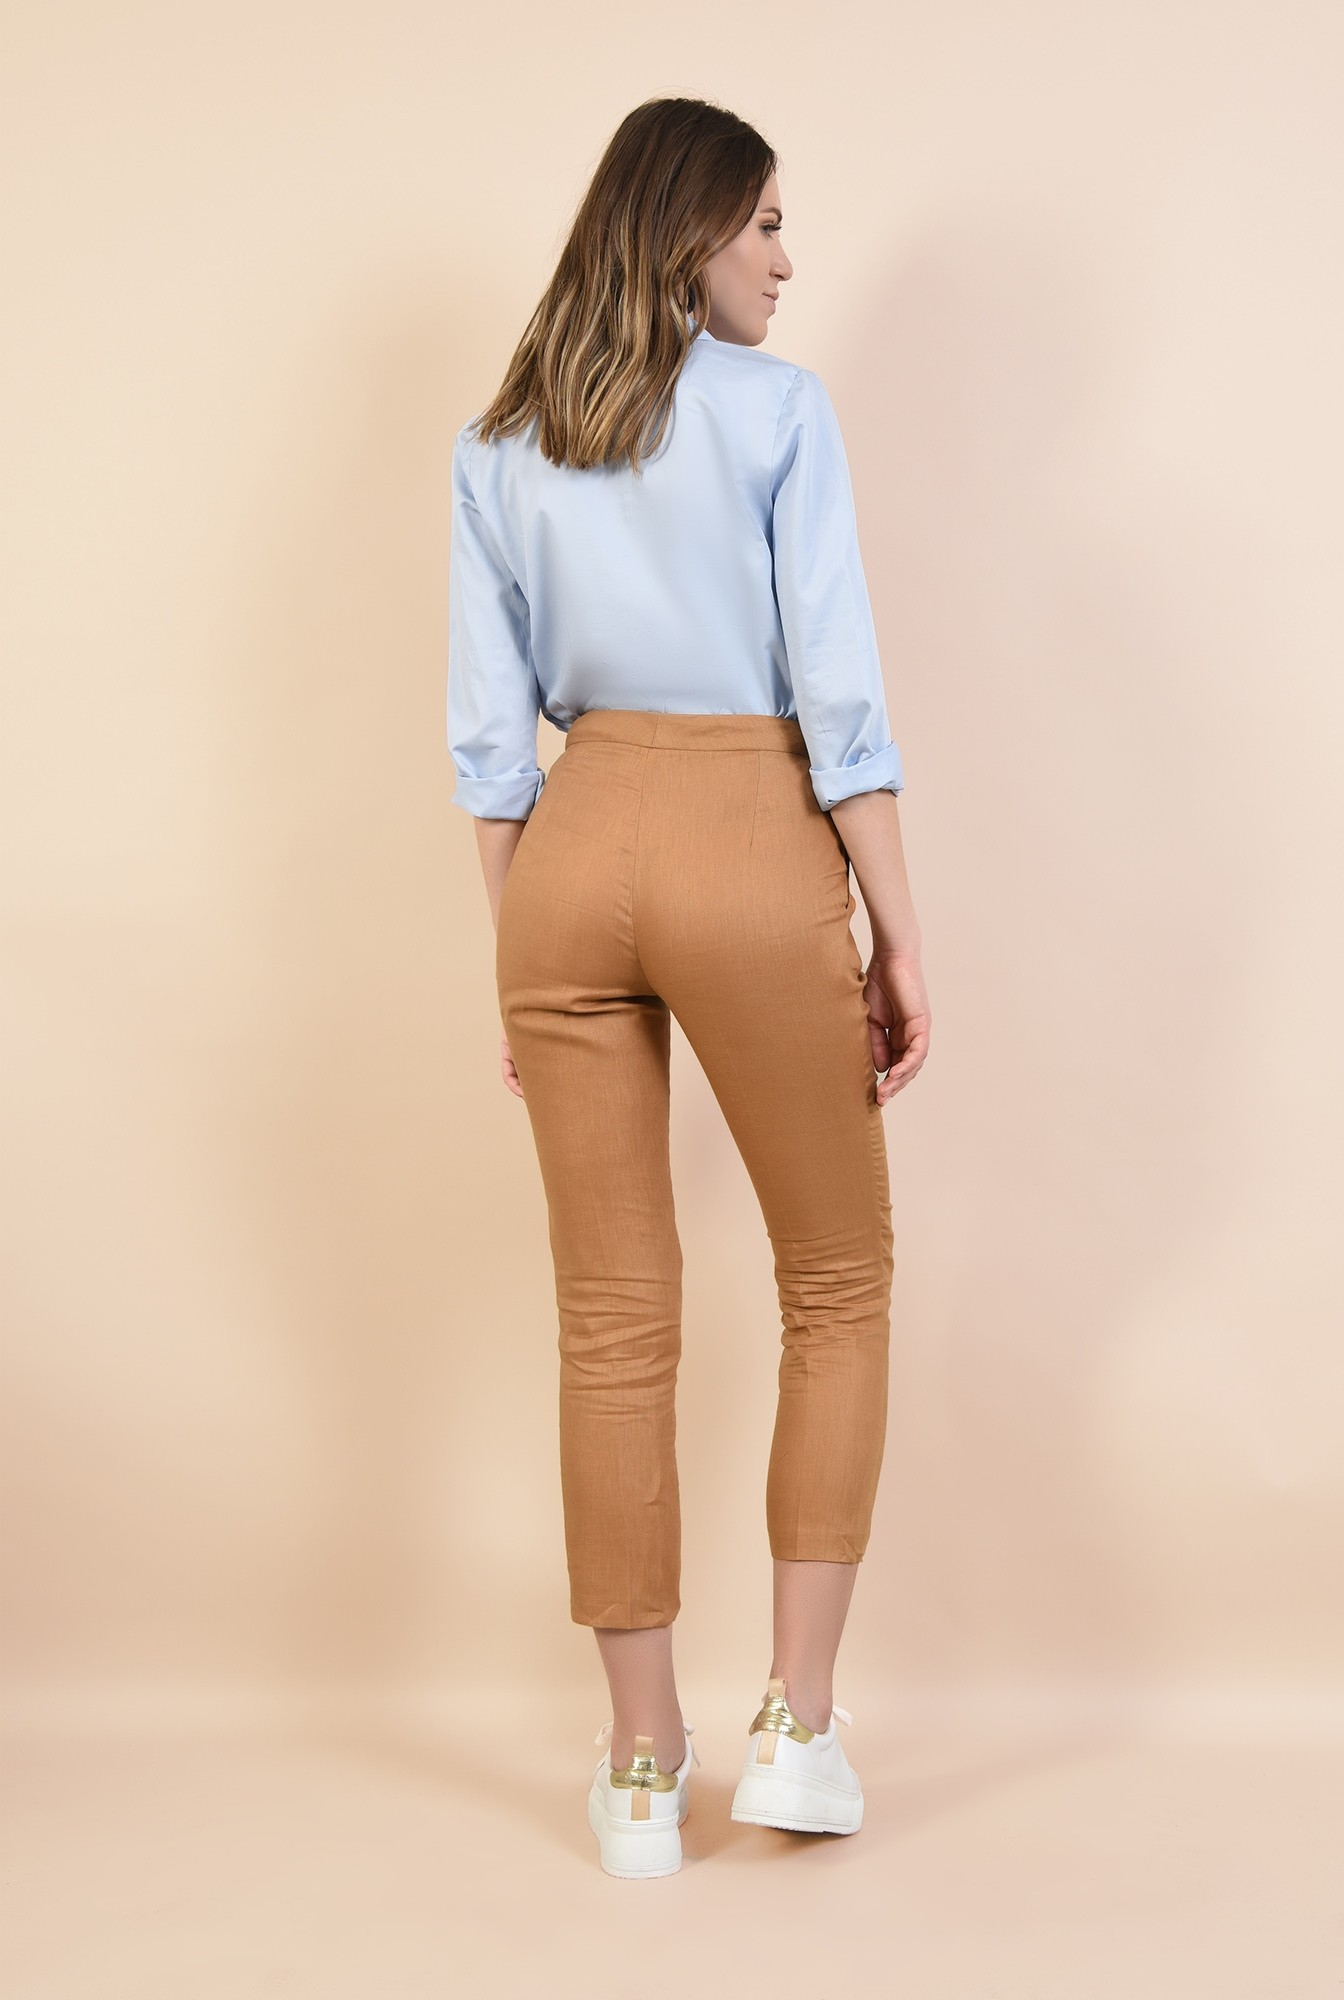 1 - pantaloni de zi, din in, croi tigareta, buzunare in cusatura